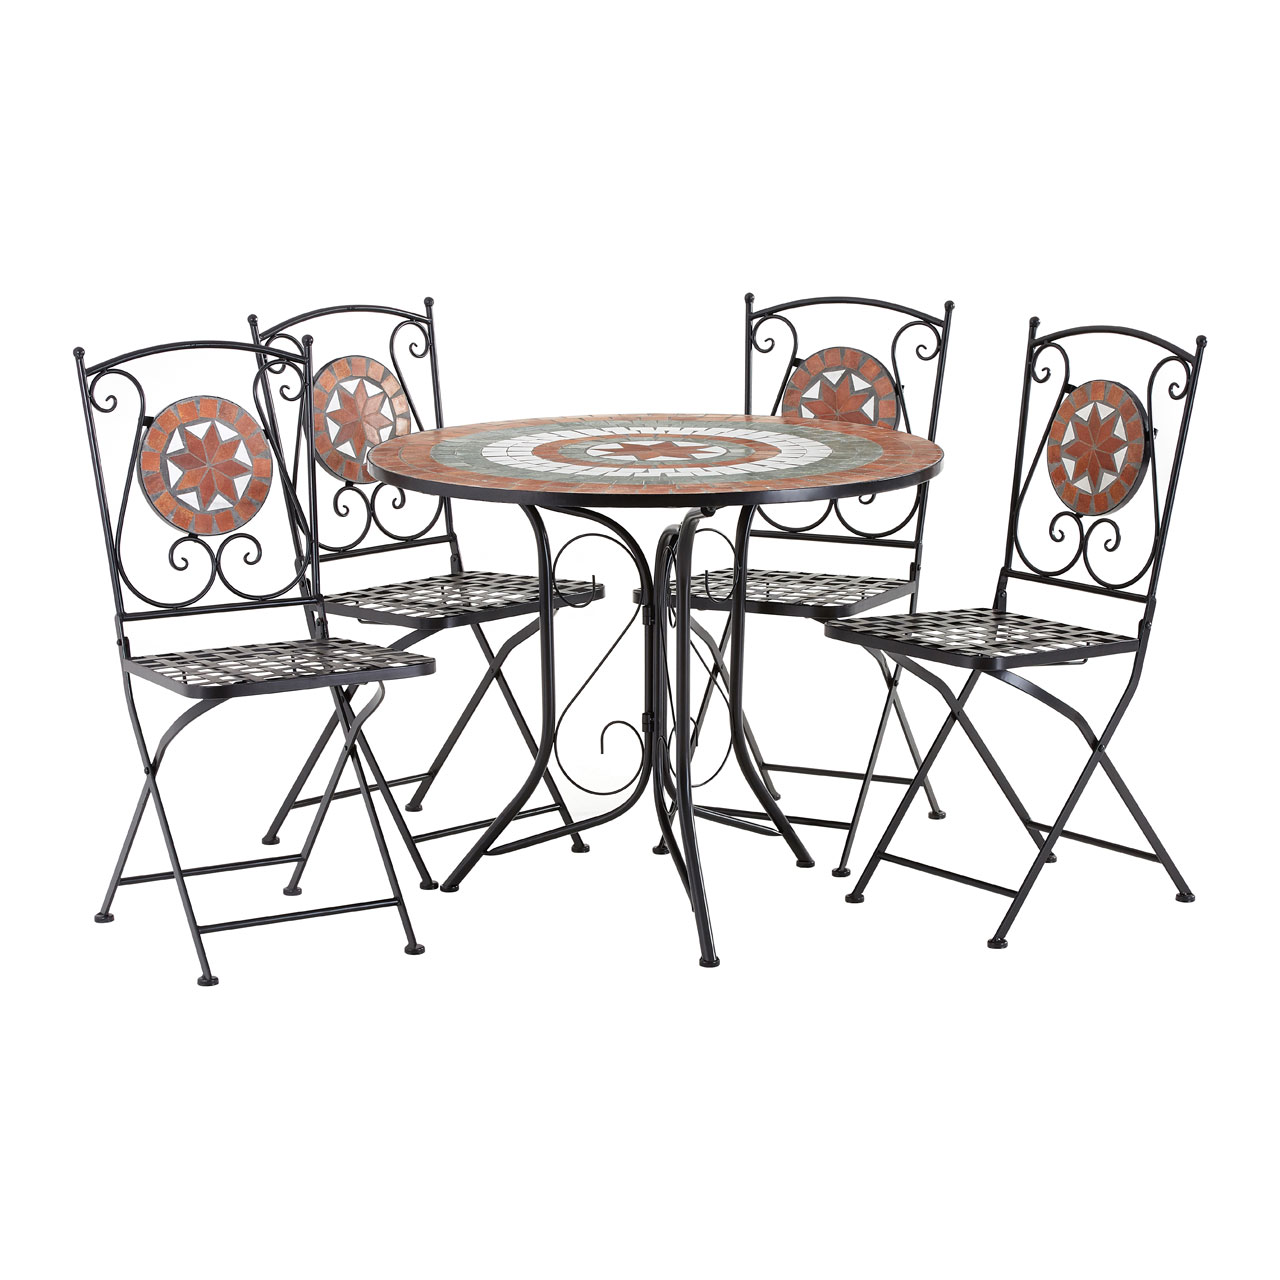 Amalfi Table Set Table 4 Folding Chairs Terracotta Mosaic